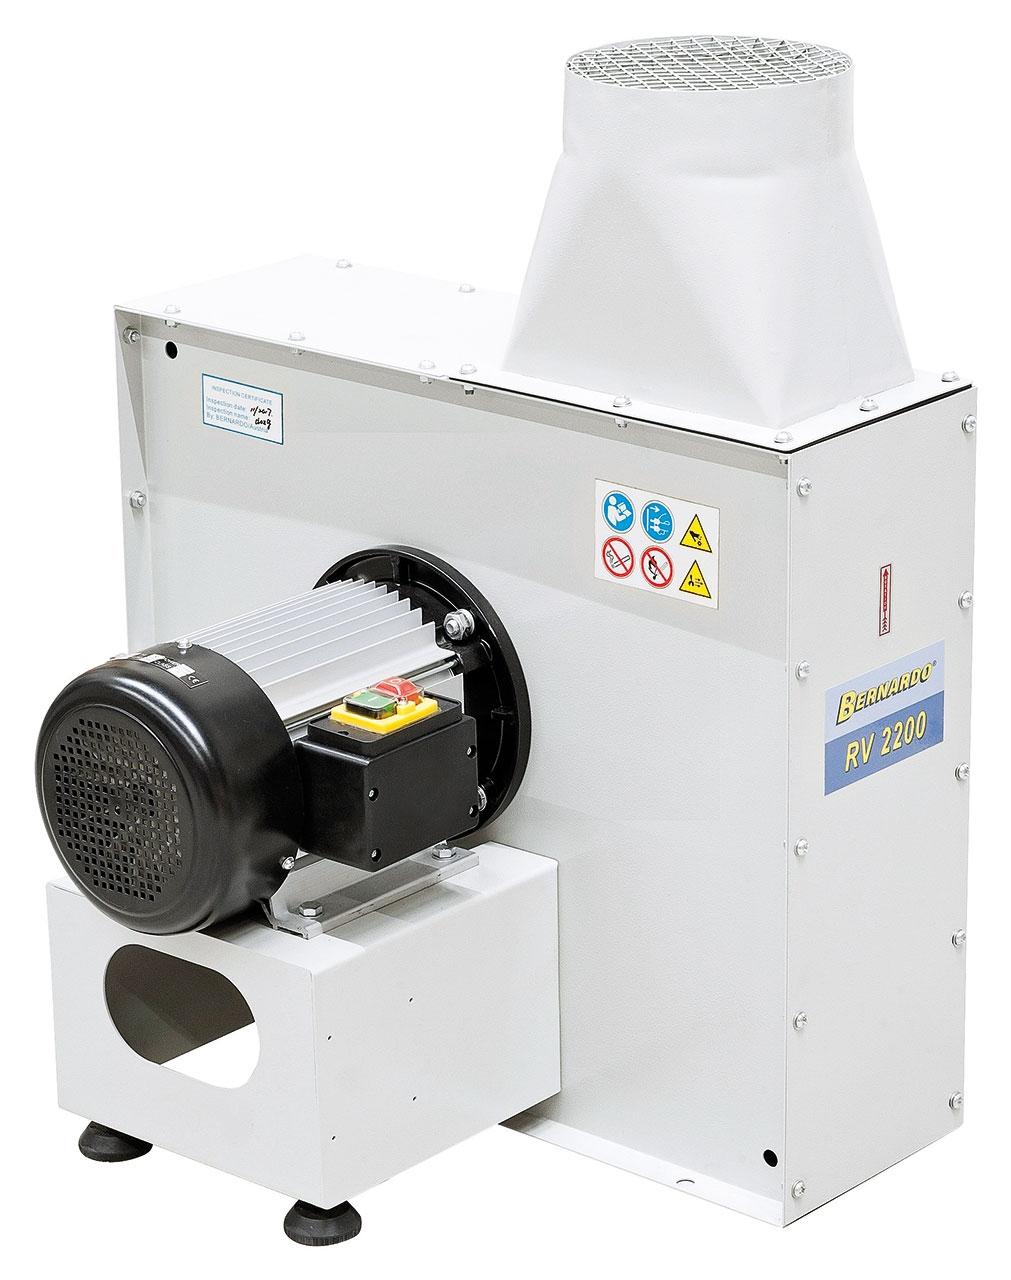 Wentylator promieniowy RV 2200 BERNARDO